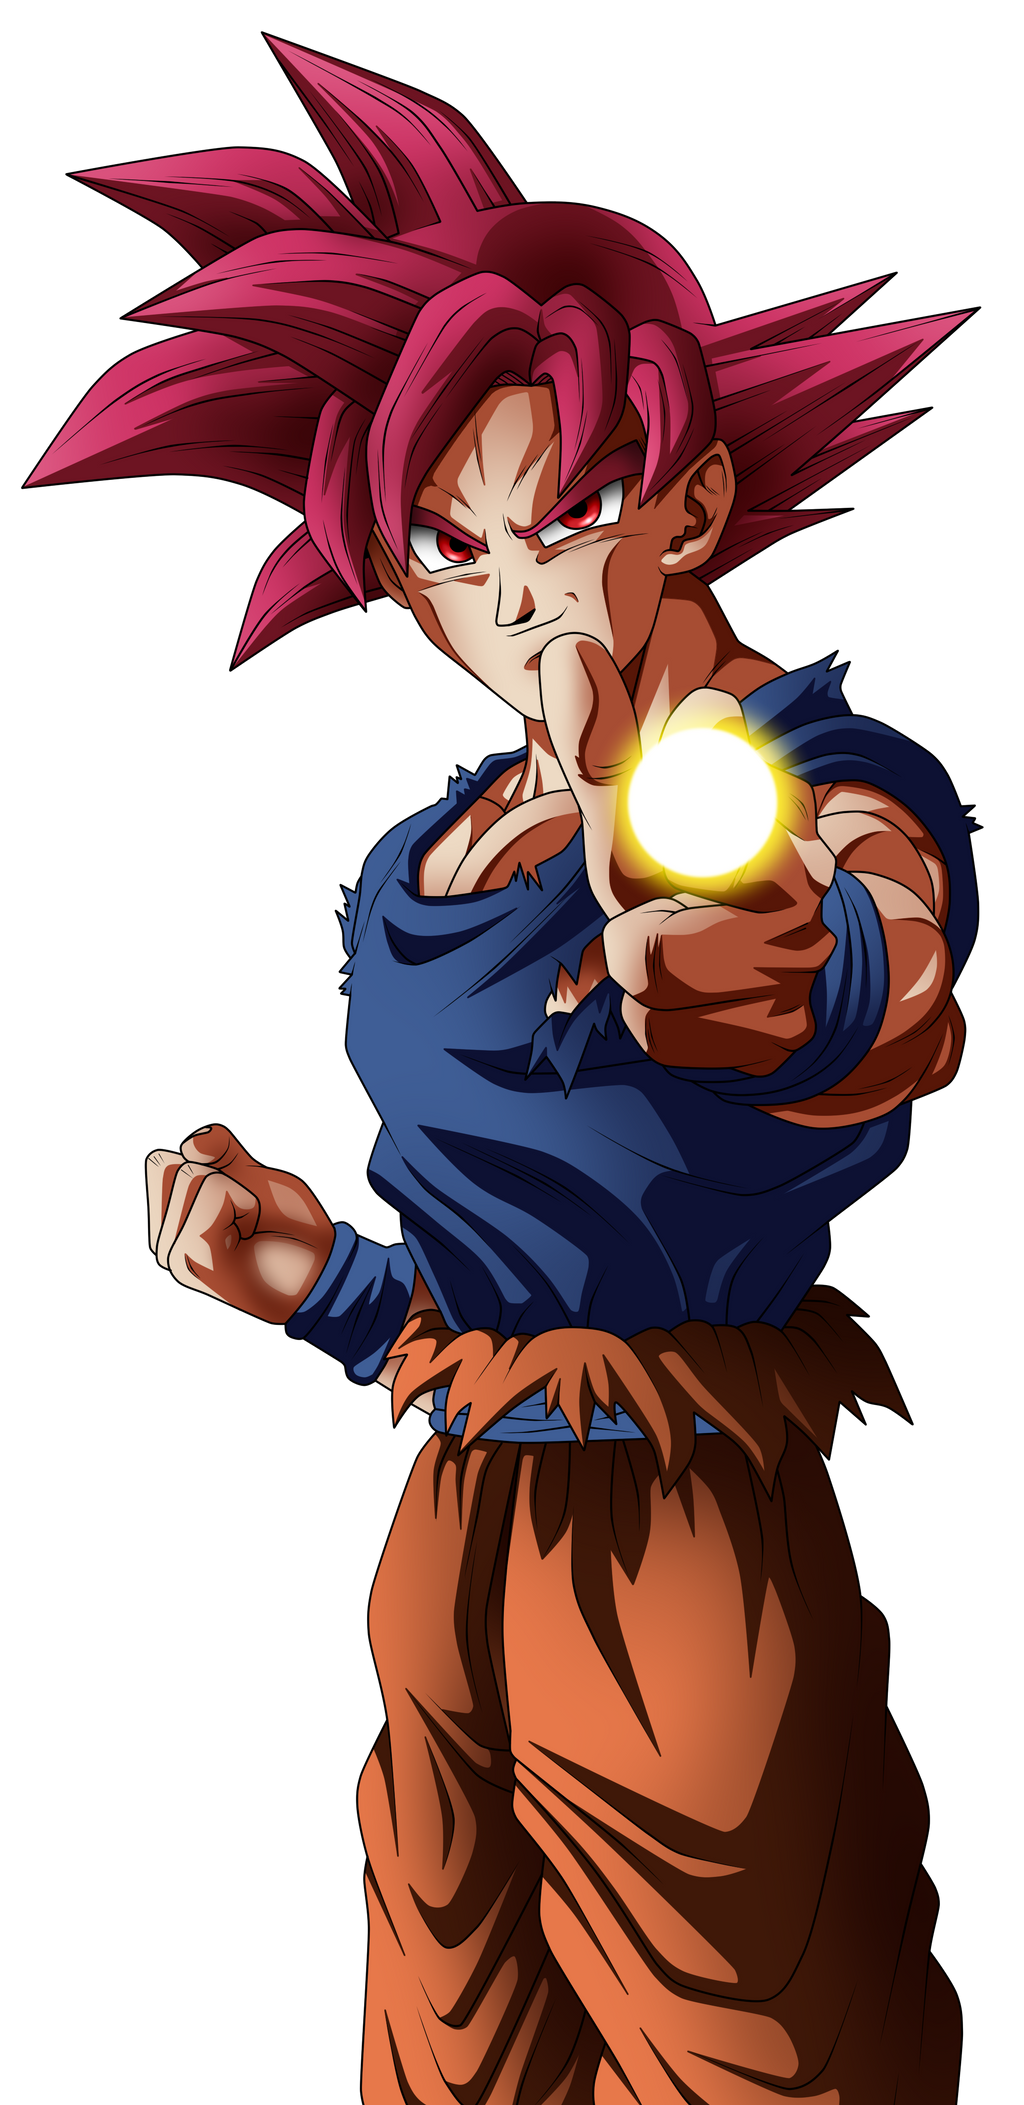 Super saiyan god goku by angelarts2 on deviantart - Sangoku super saiyan god ...